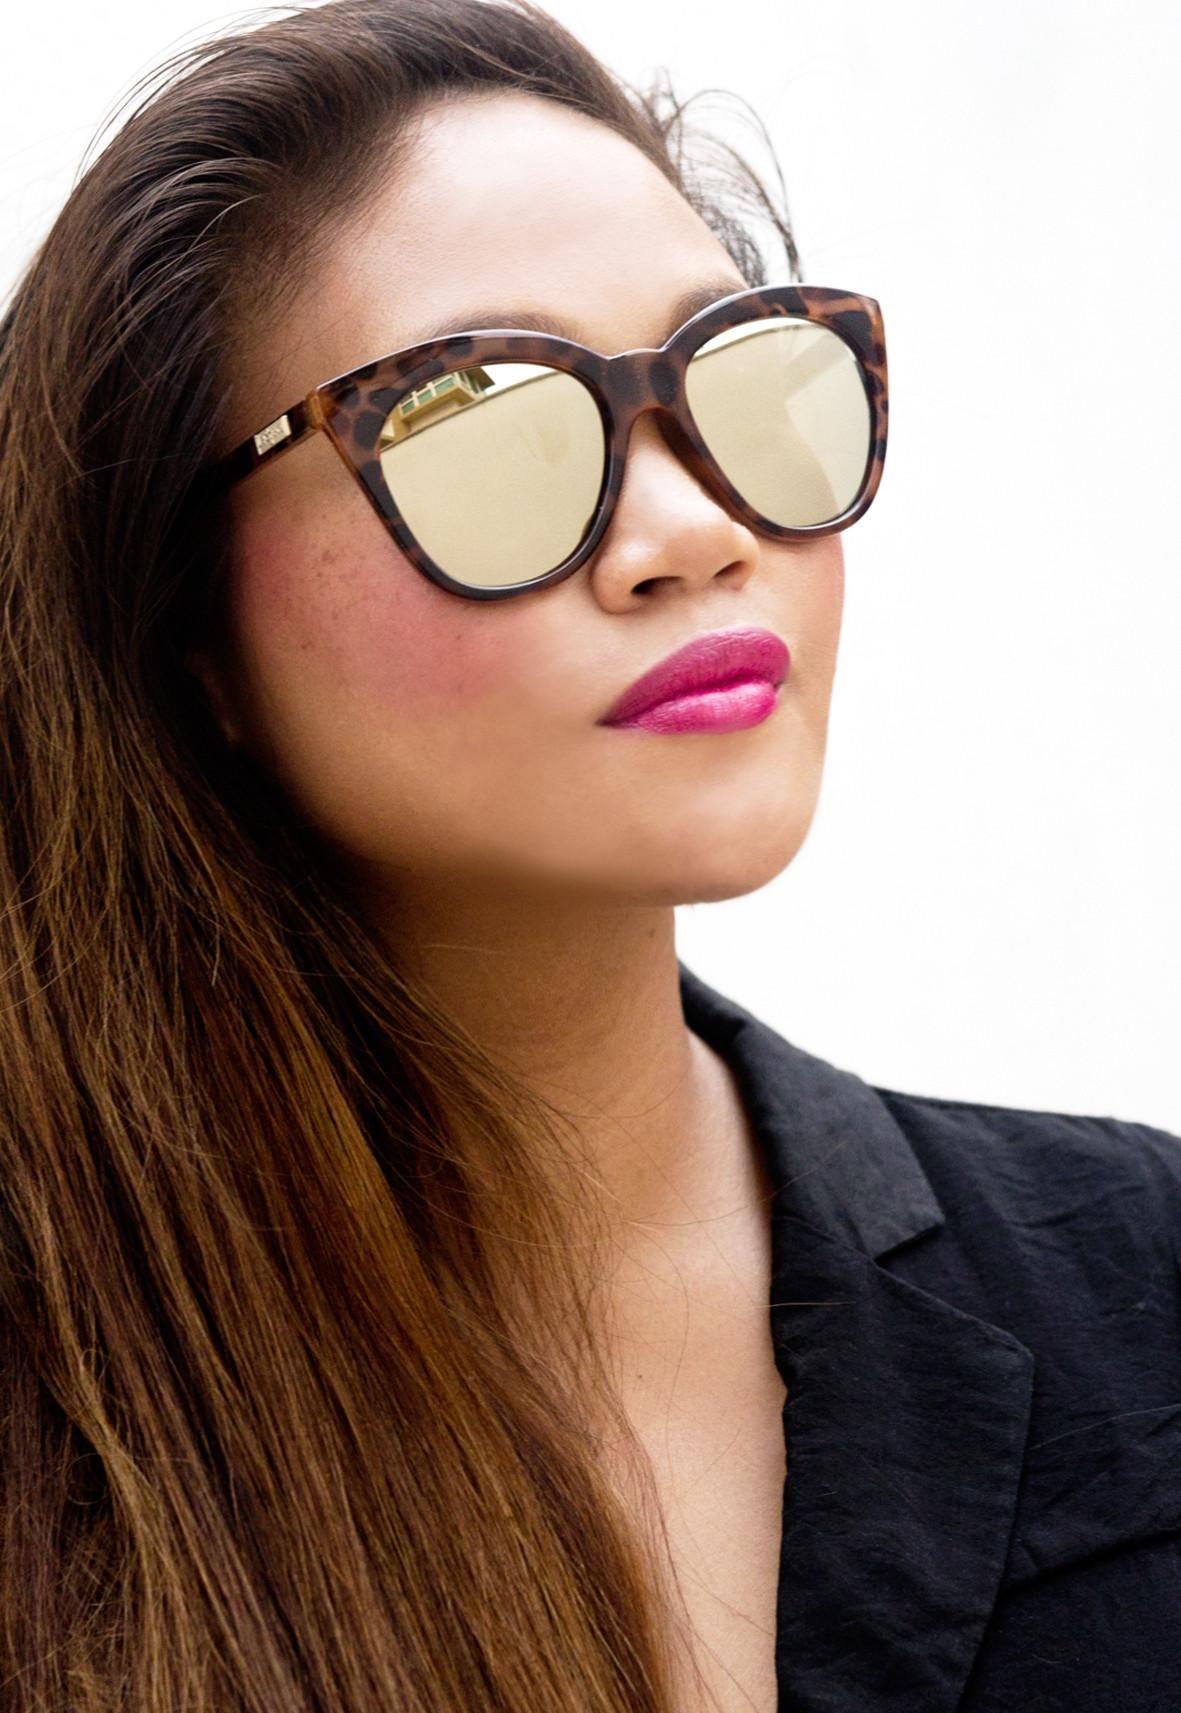 b0832046ac Le Specs Halfmoon Magic Sunglasses - Tort